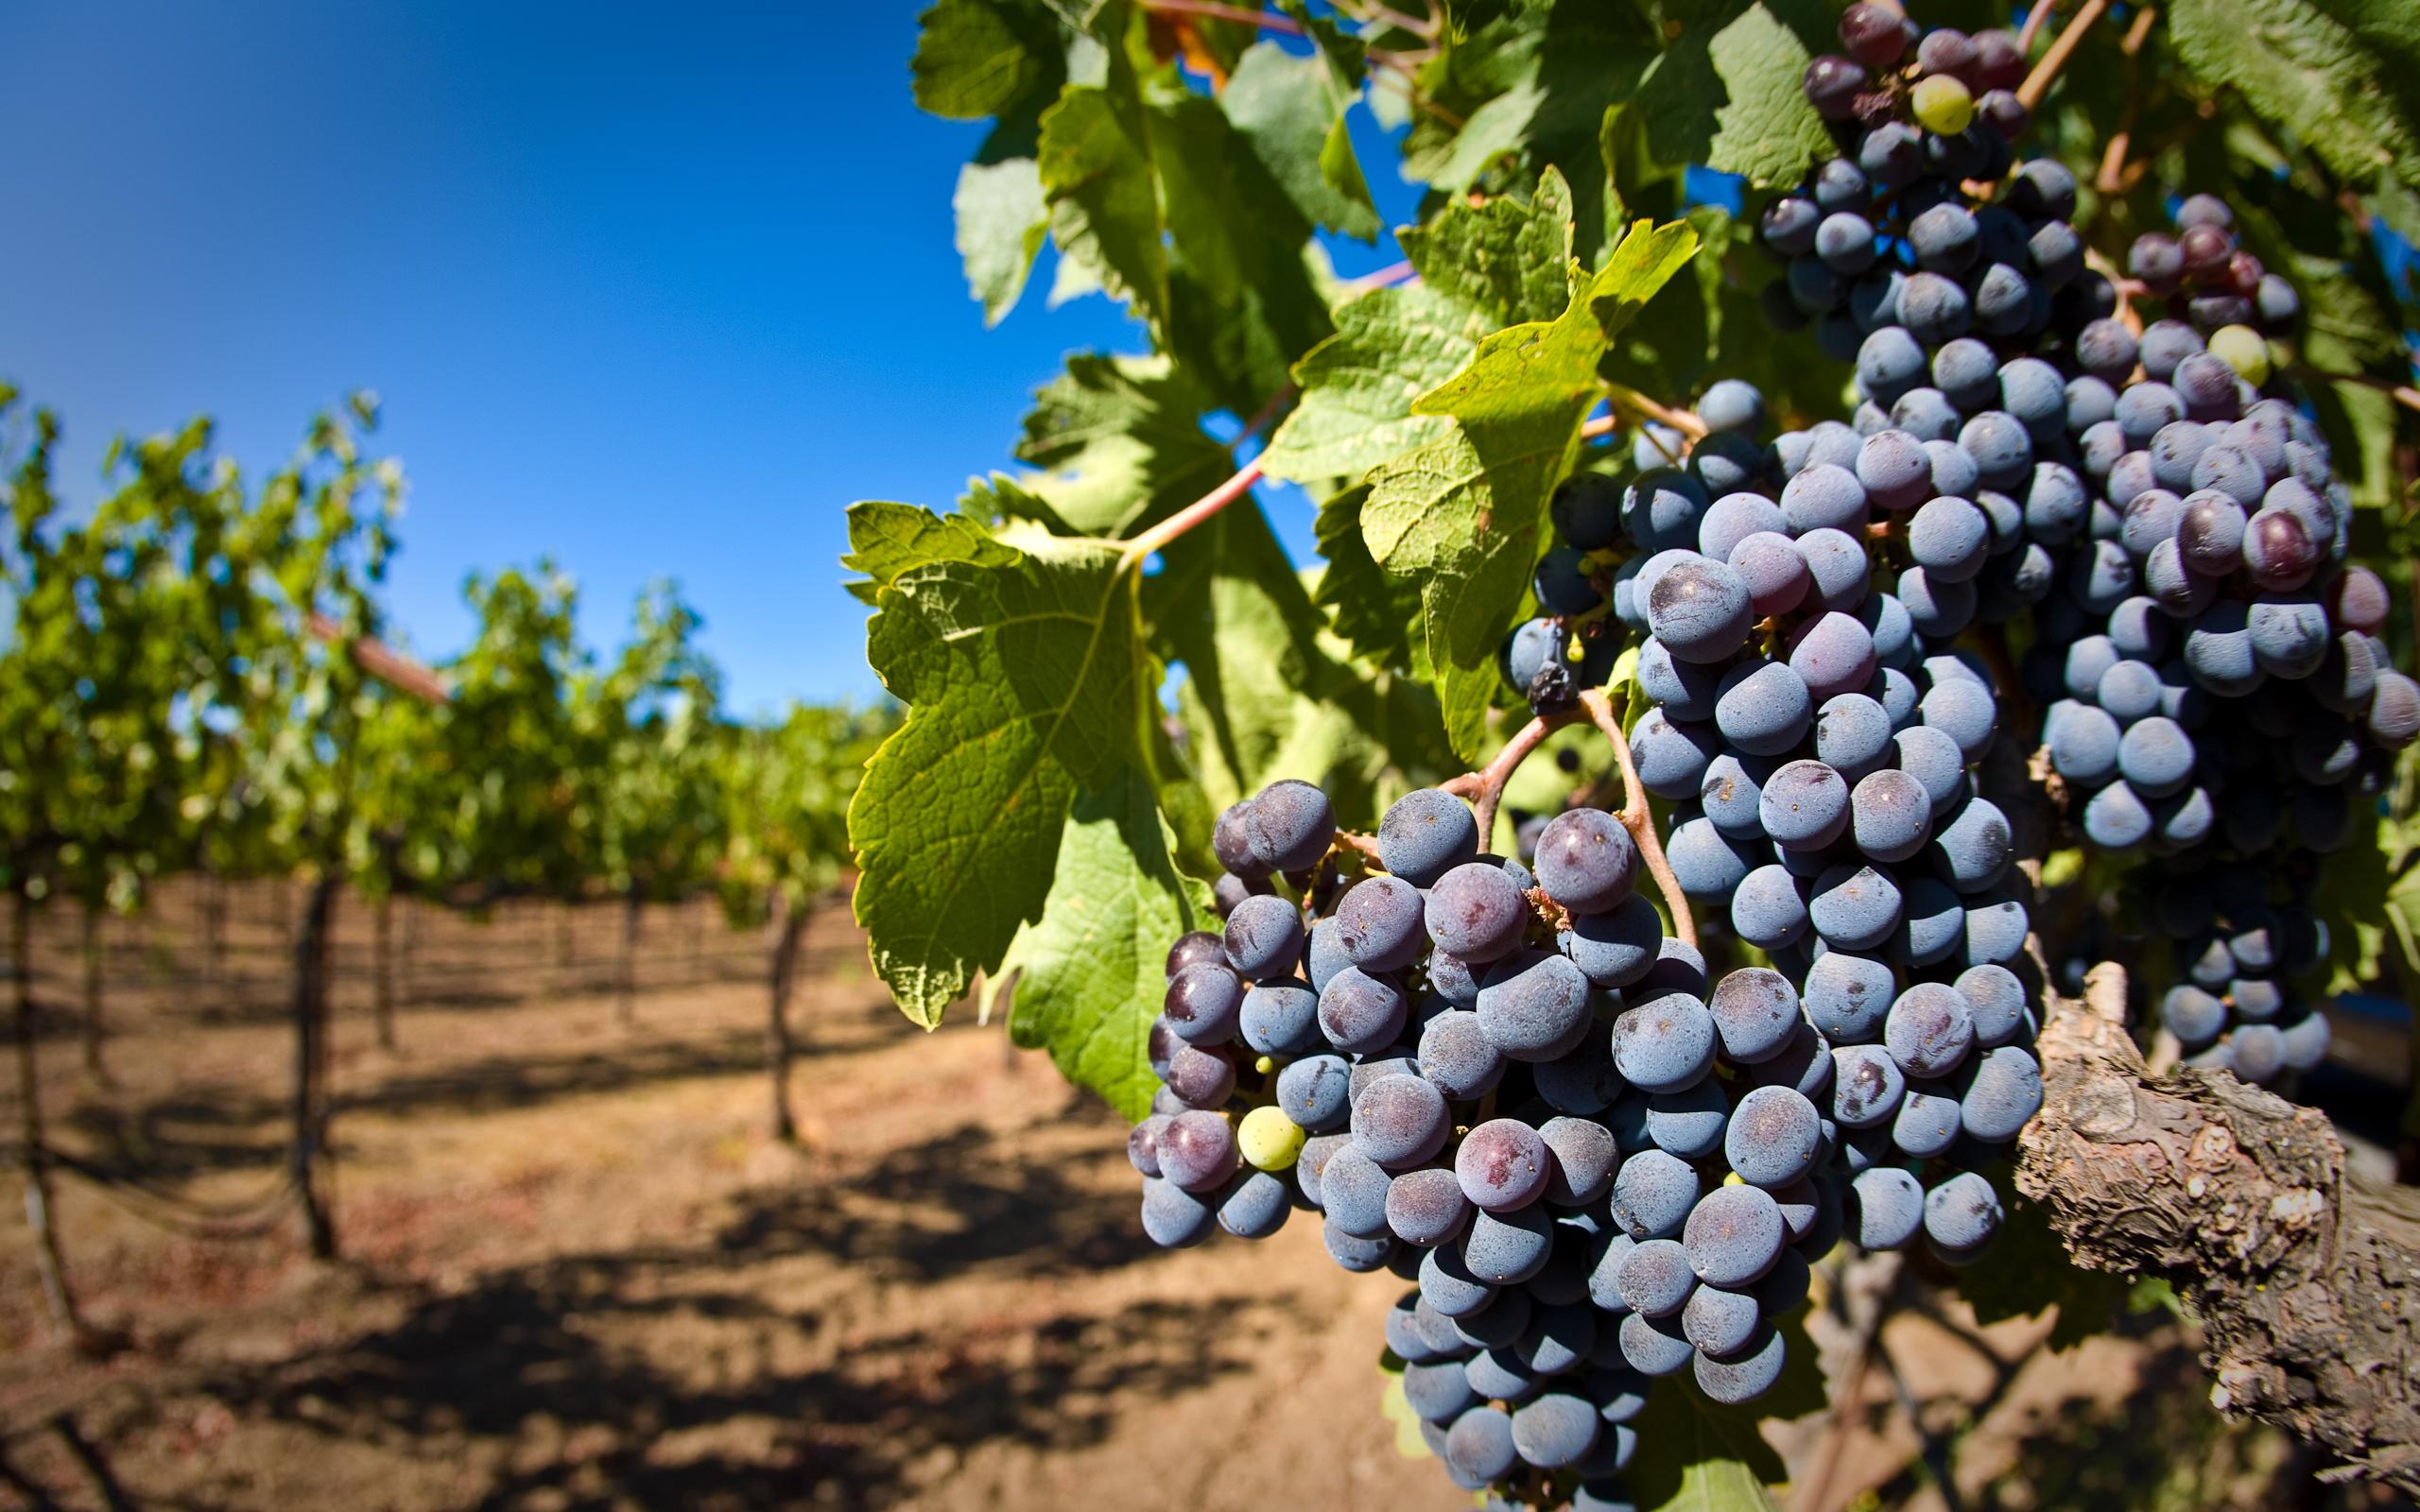 Should we open the EU wine market?